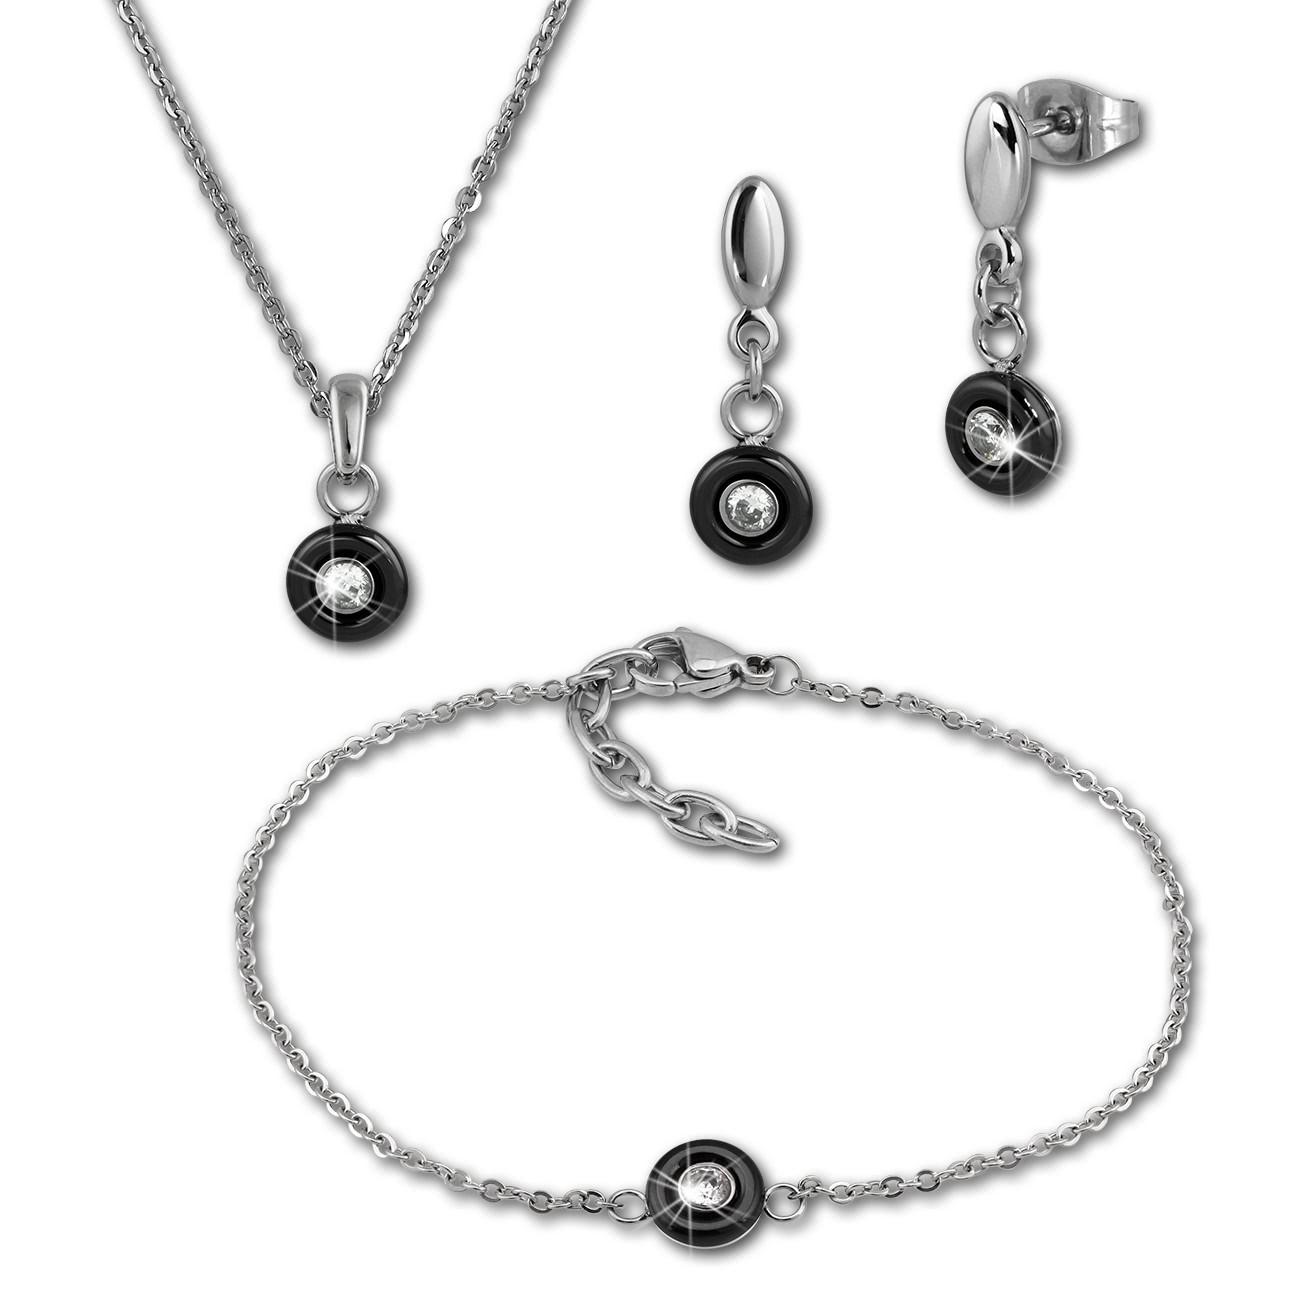 Amello Edelstahlschmuckset Keramik Zirkonia Kette, Armband, Ohrring ESSX35S